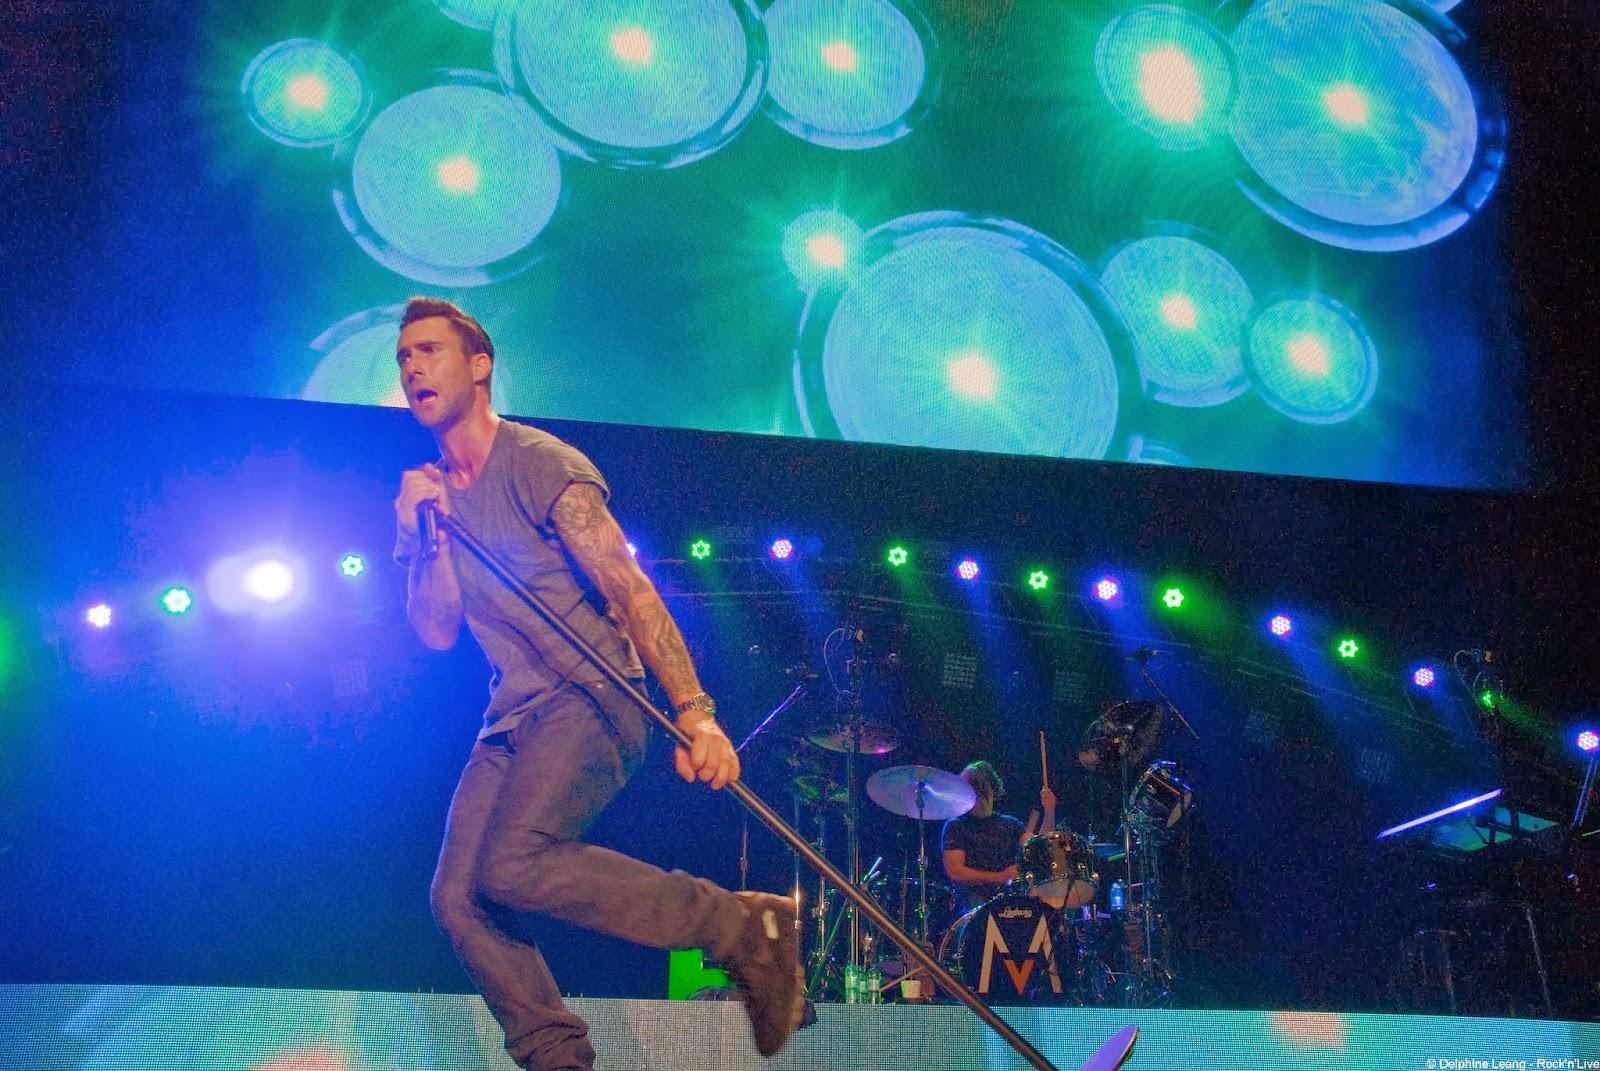 Maroon 5 Adam Levine Bercy 2013 Rock'n'Live Report Paris Concert Delphine Leang This Love